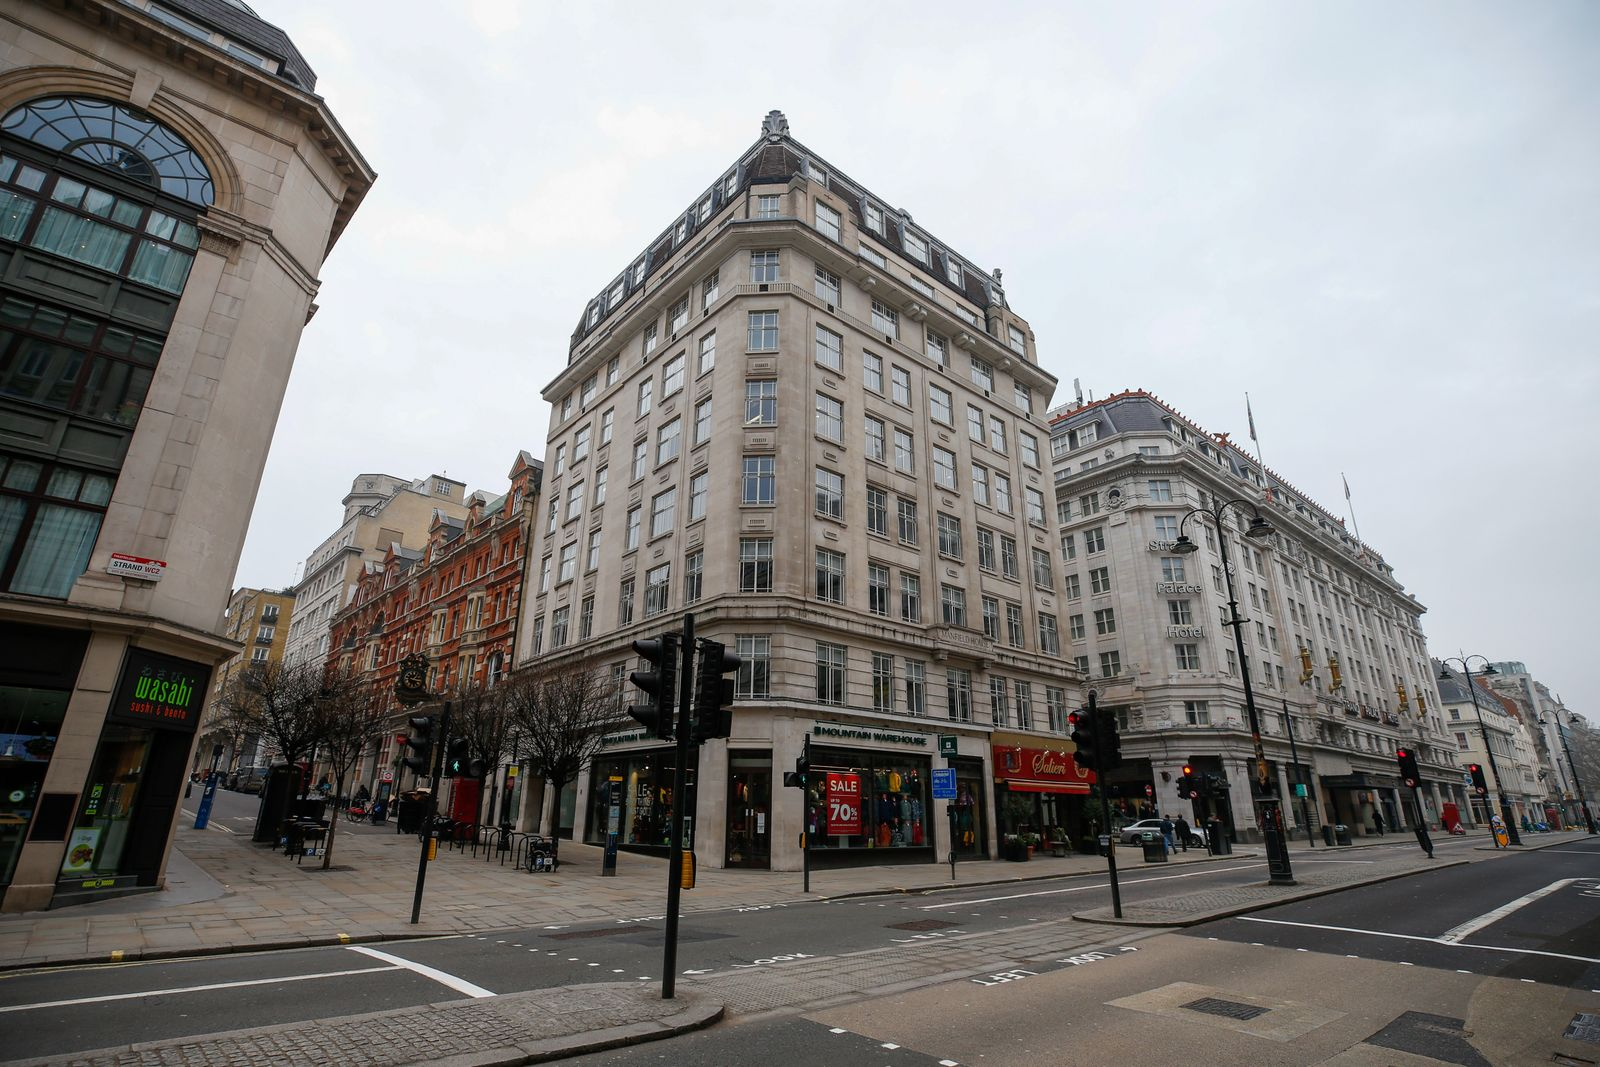 Greensill Capital Headquarters As Company Starts U.K. Insolvency Process